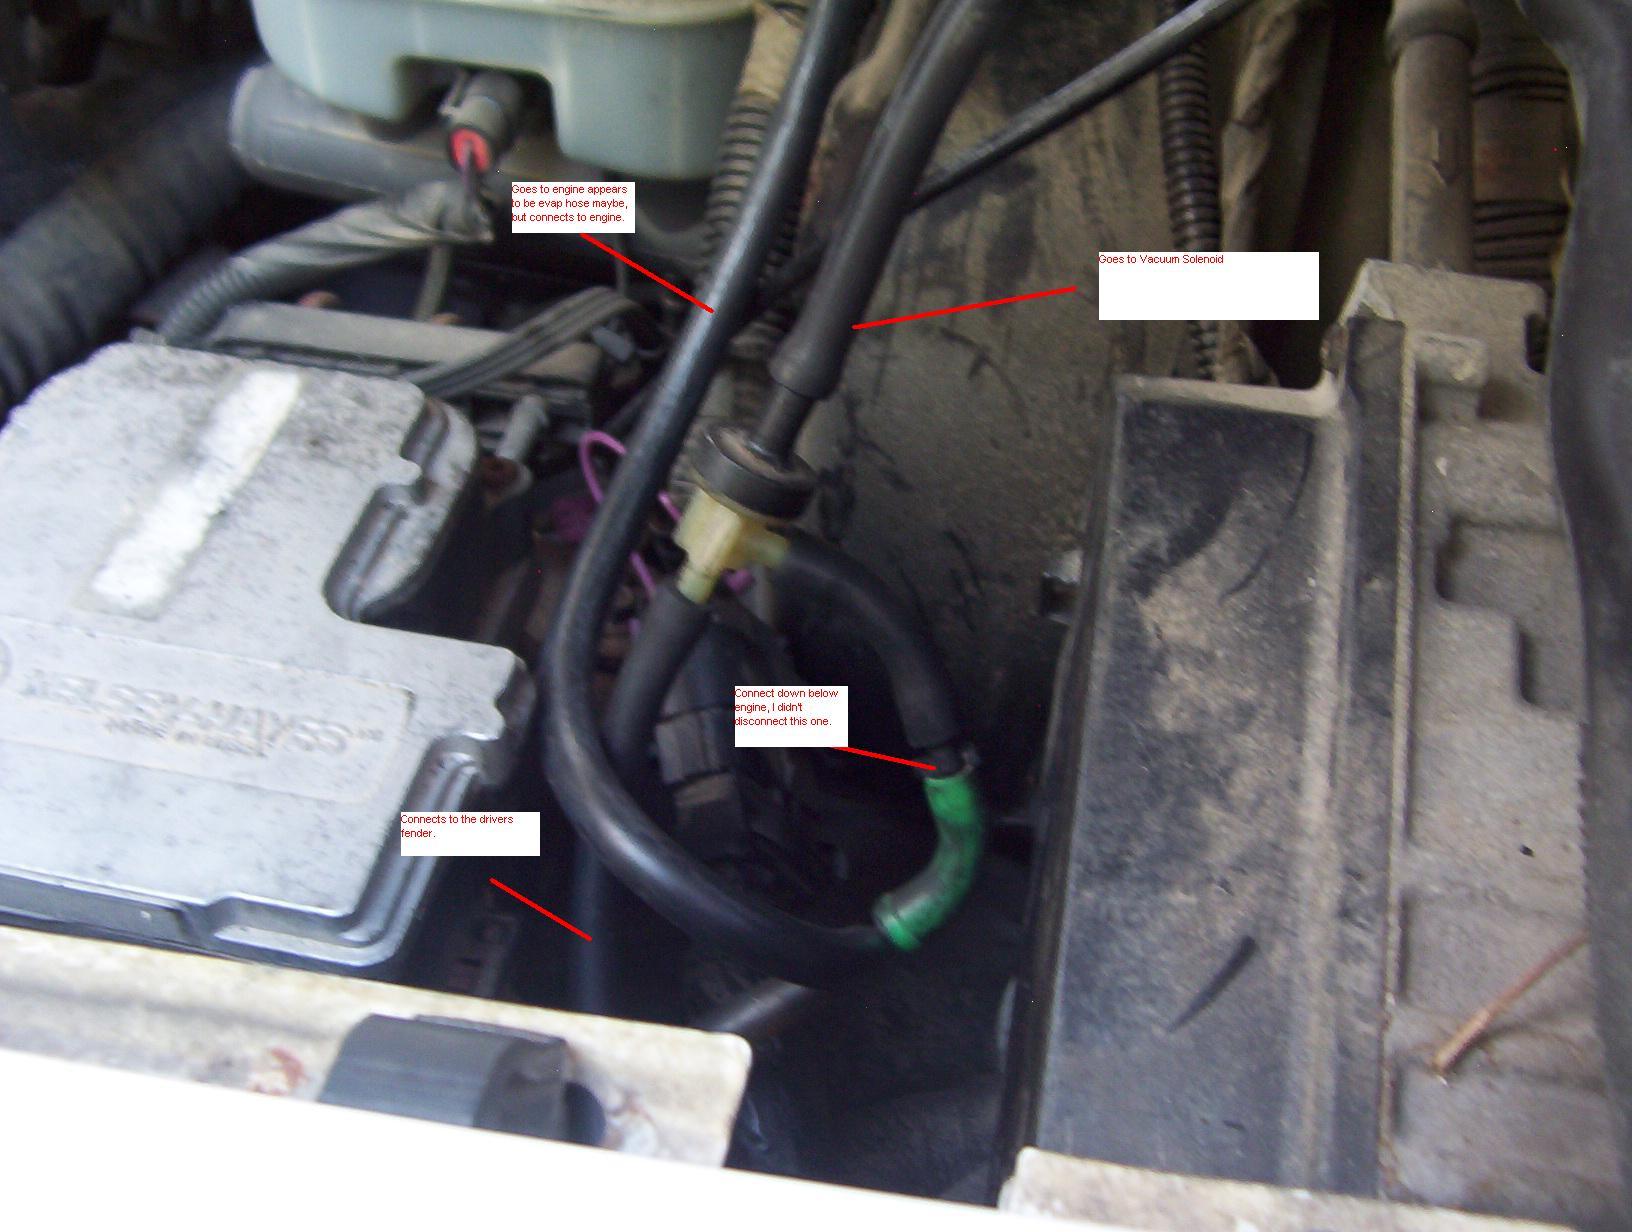 2001 Chevy Blazer 4 Wheel Drive Problems